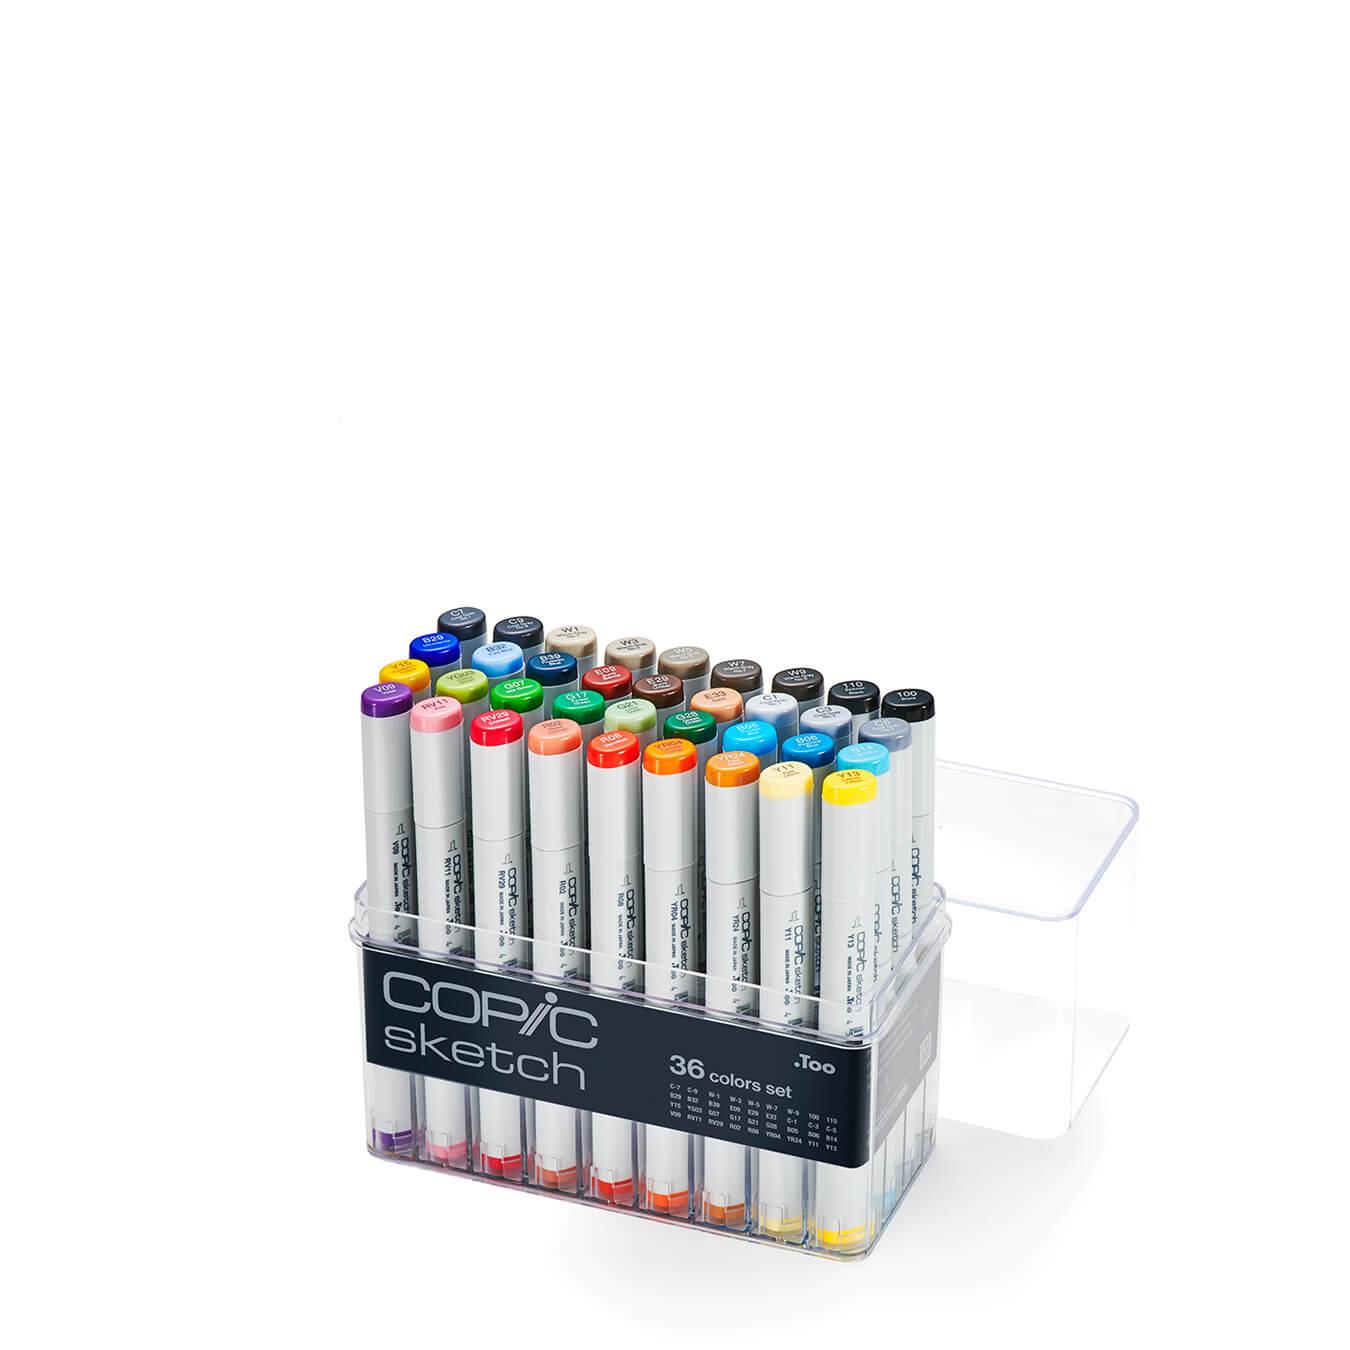 Copic Sketch 36 colors set